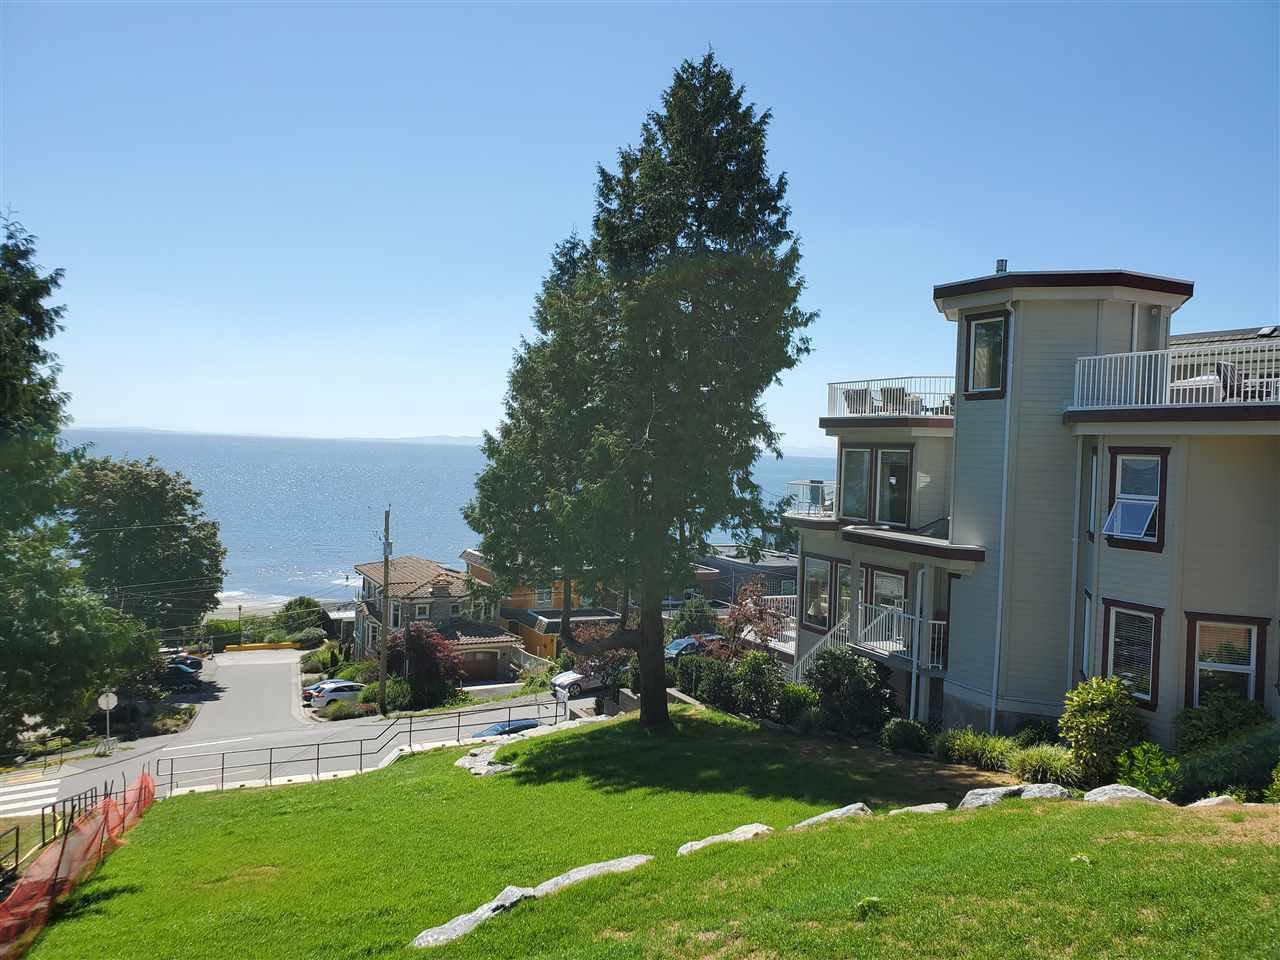 Photo 23: Photos: 15395 VICTORIA Avenue: White Rock House for sale (South Surrey White Rock)  : MLS®# R2476831